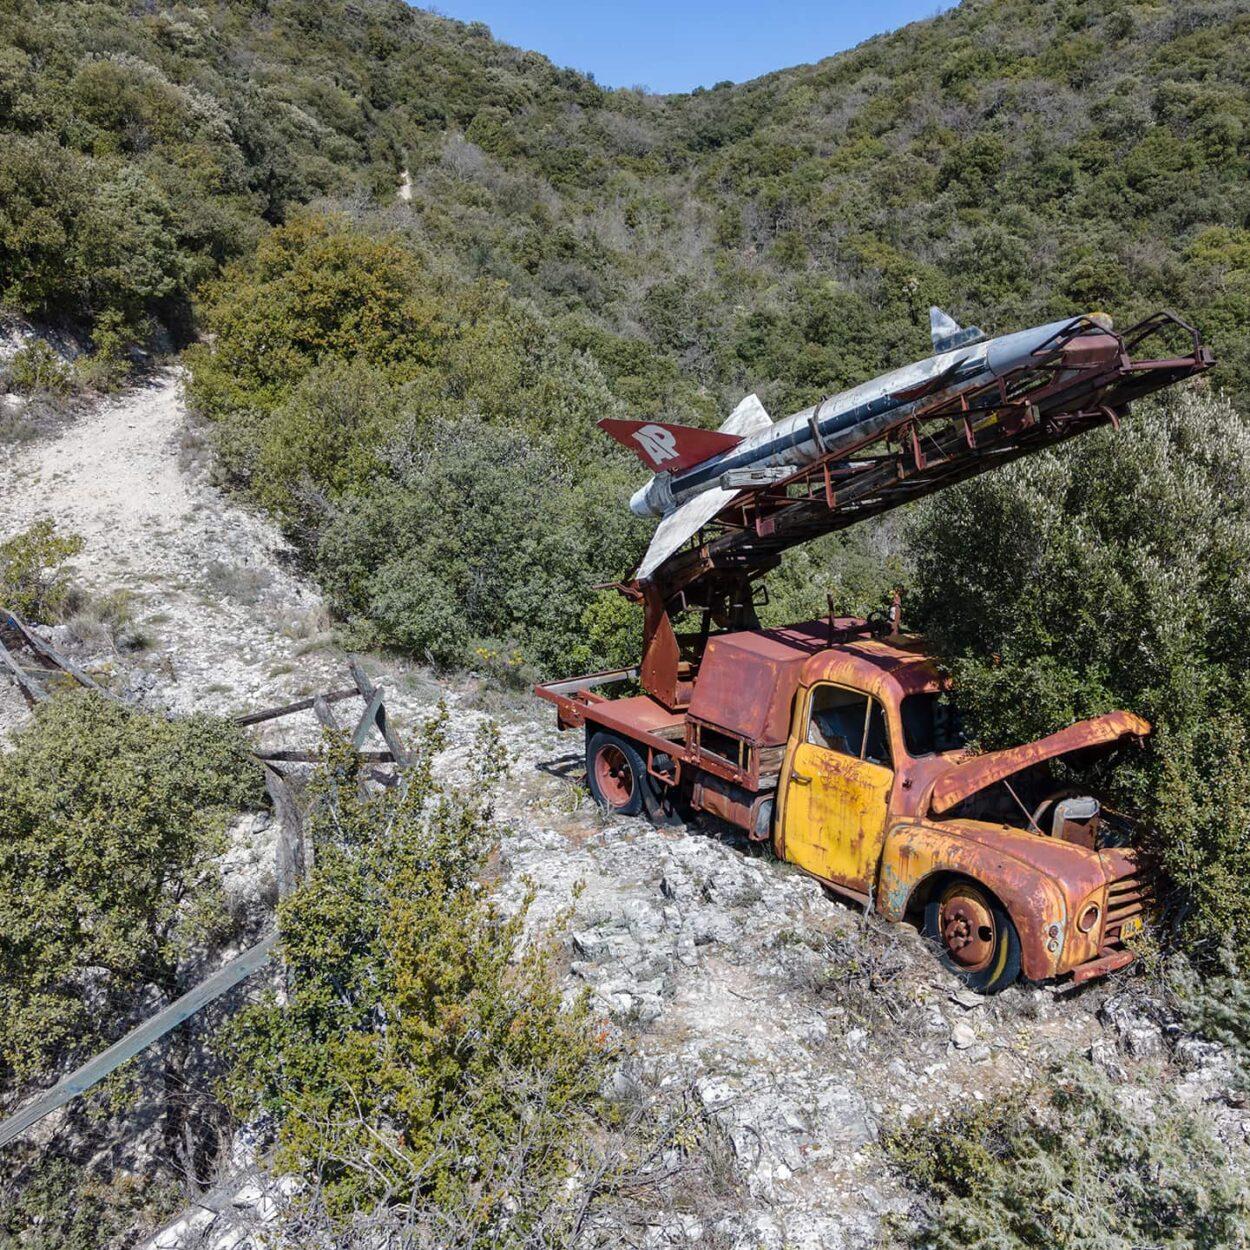 urbex-drone-dji-mavic-air-exploration-missile-matra